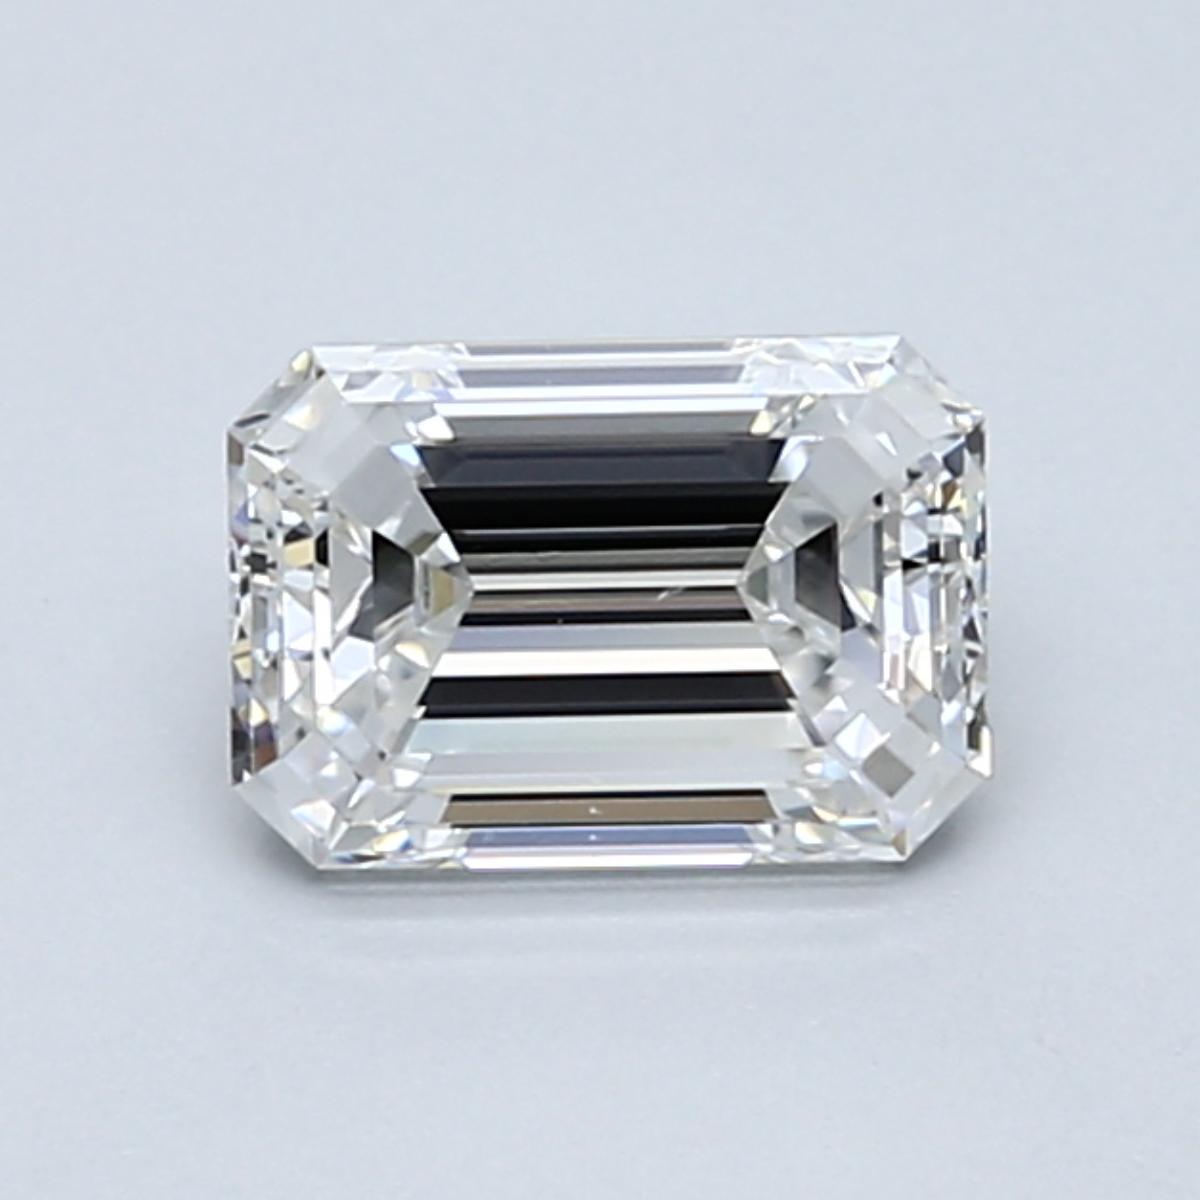 1.01 carat Emerald Diamond, Very Good cut, graded by the GIA laboratories.